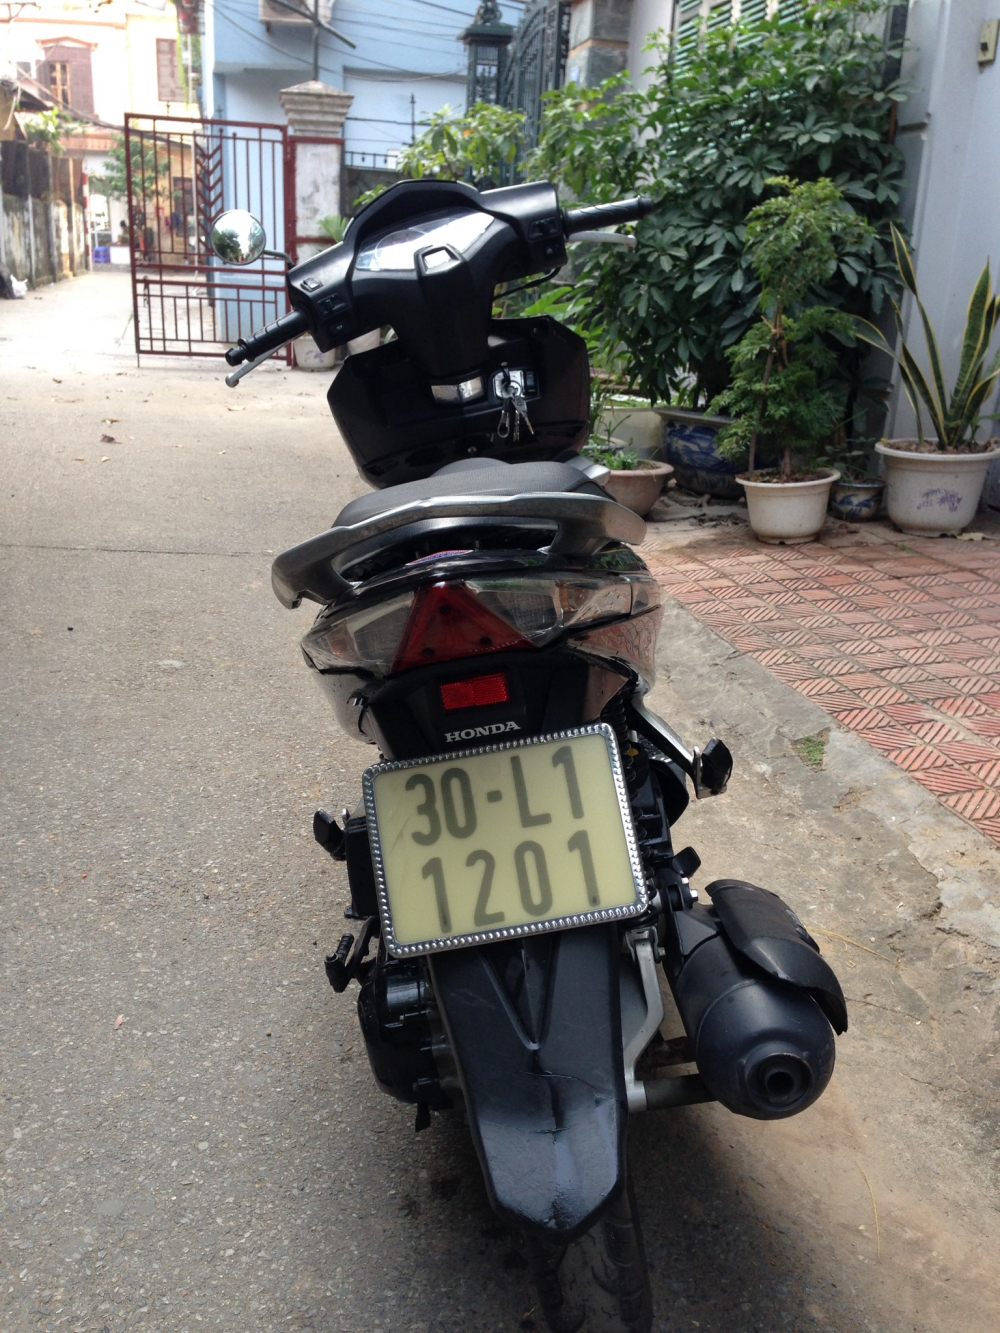 Ban xe honda airbalde 110 FI doi 2009 chinh chu bien 4 so